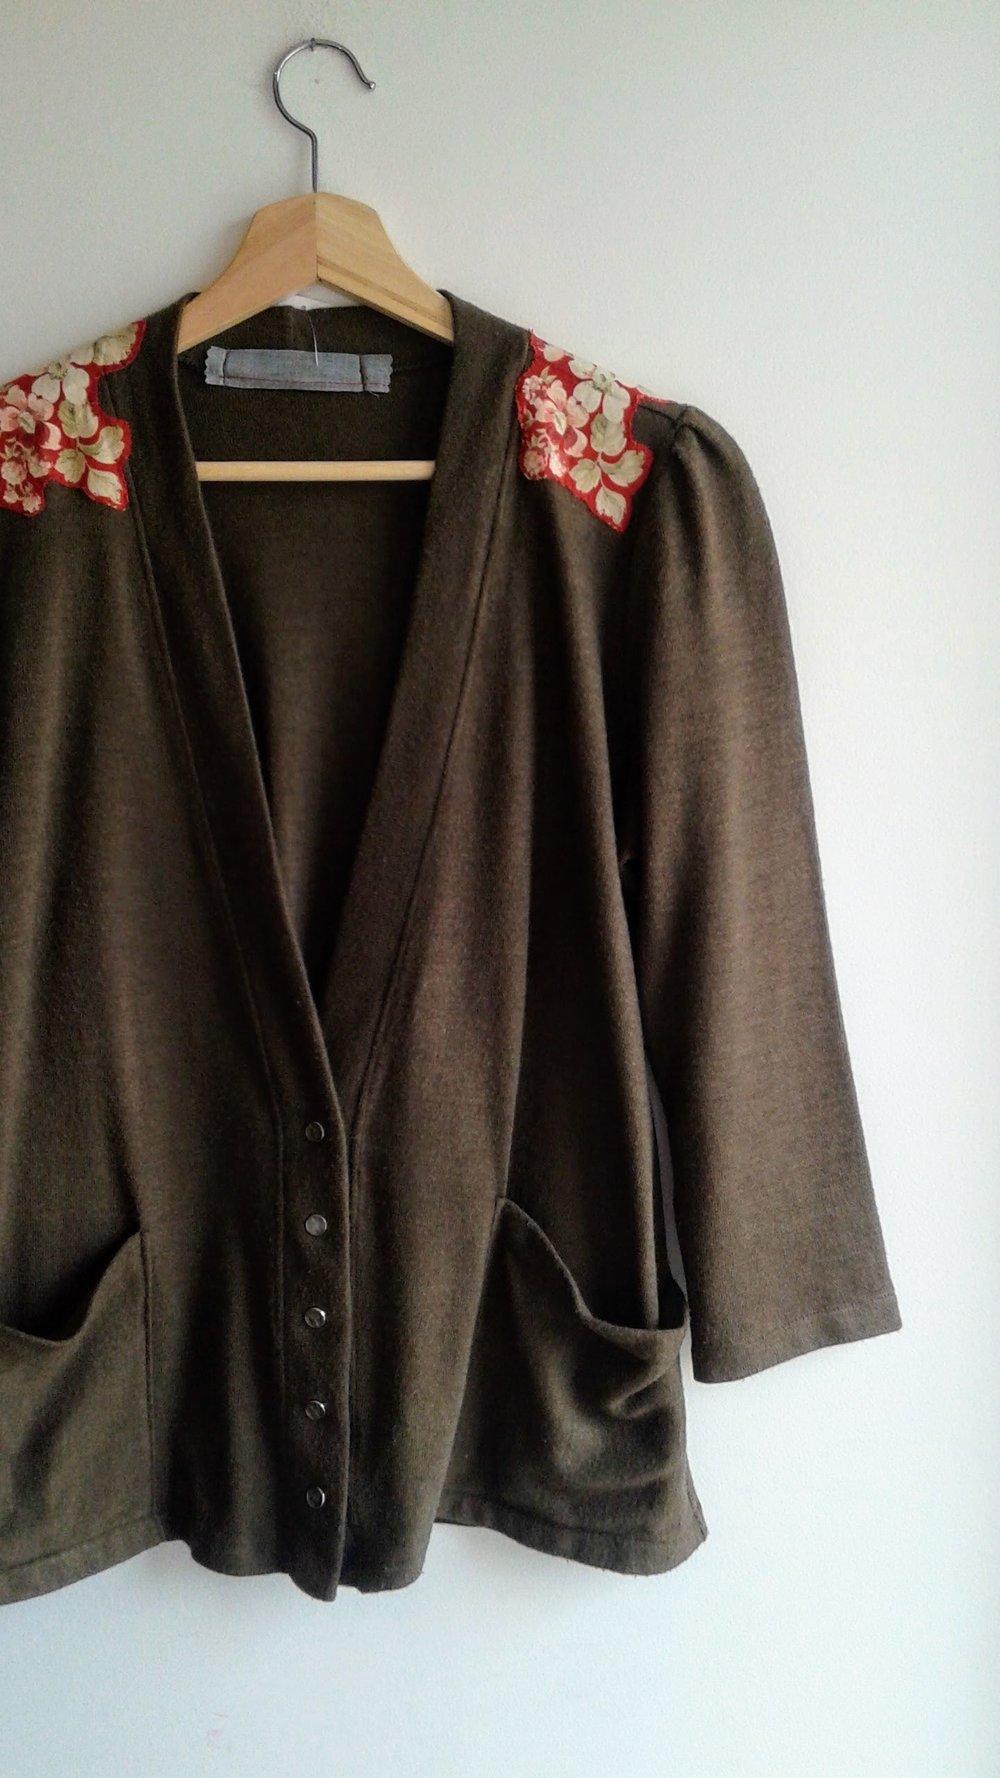 Fridget top; Size M, $28